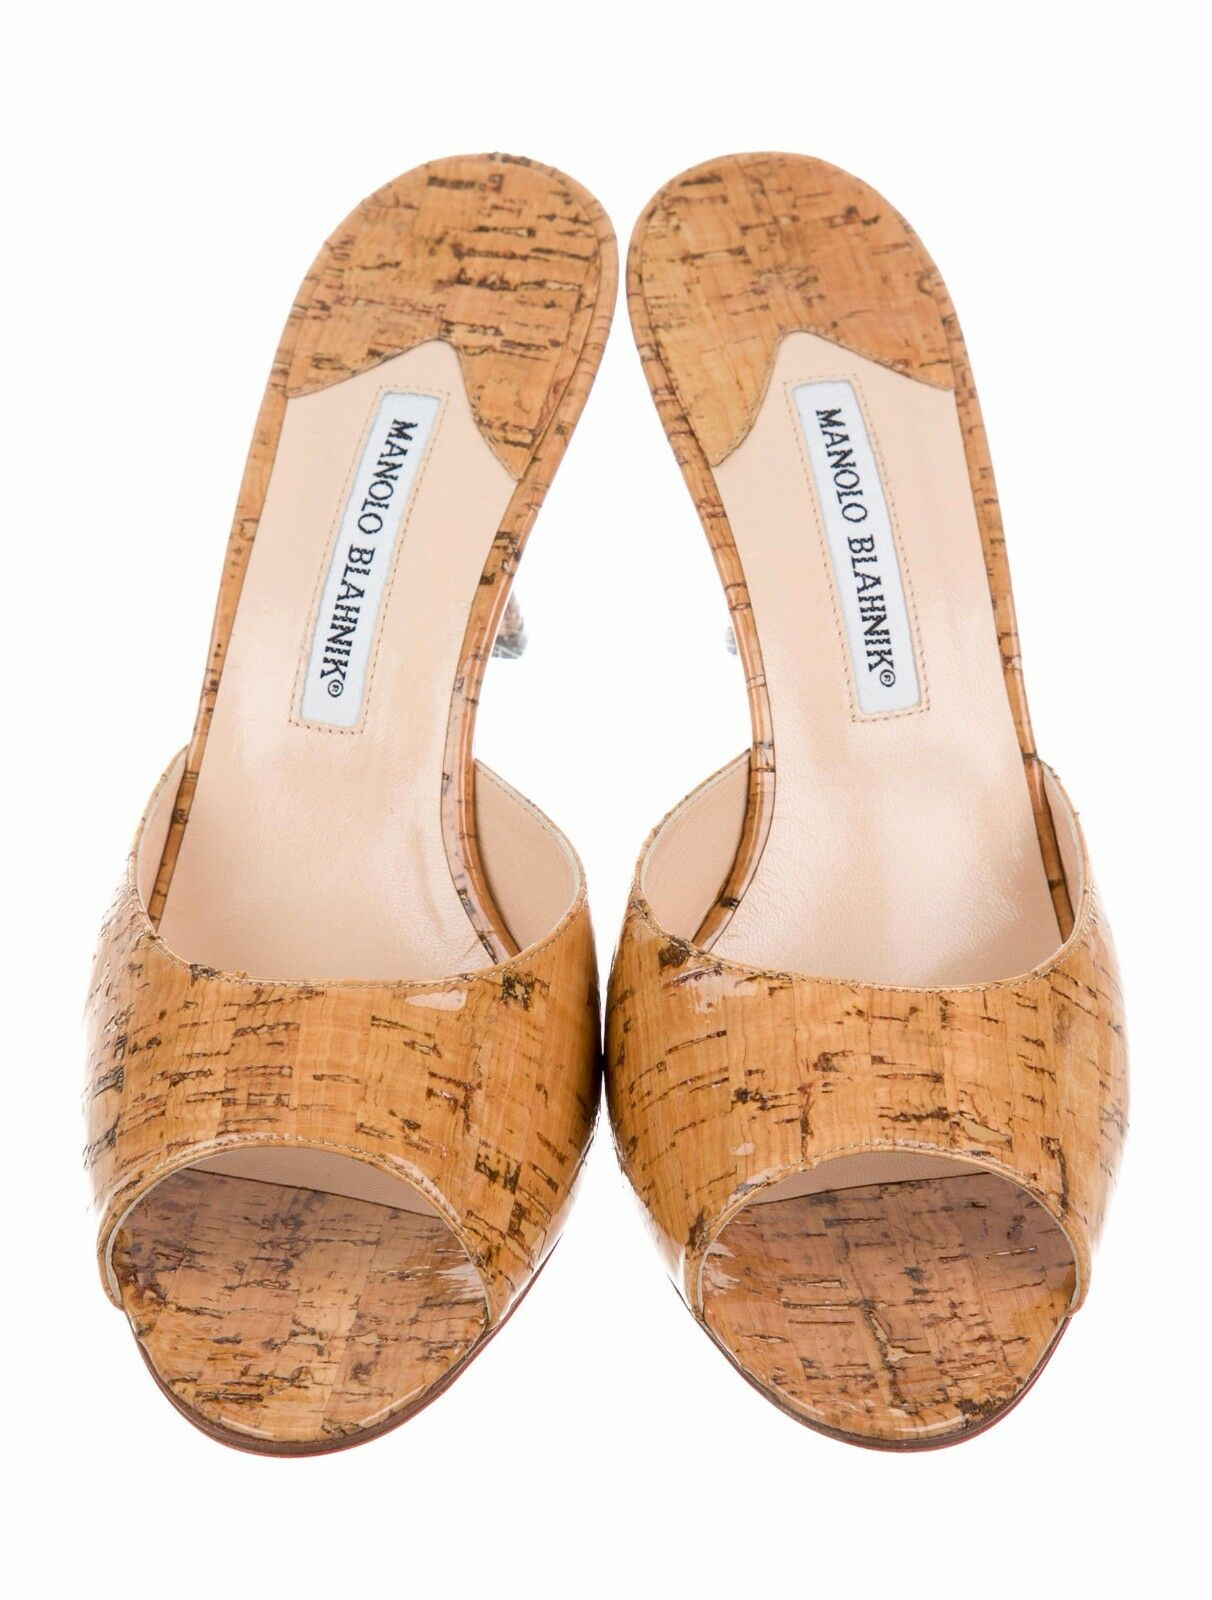 Neu Manolo Blahnik Astuta Beige Glänzend Kork Lack Slide Sandalen Schuhe 40.5